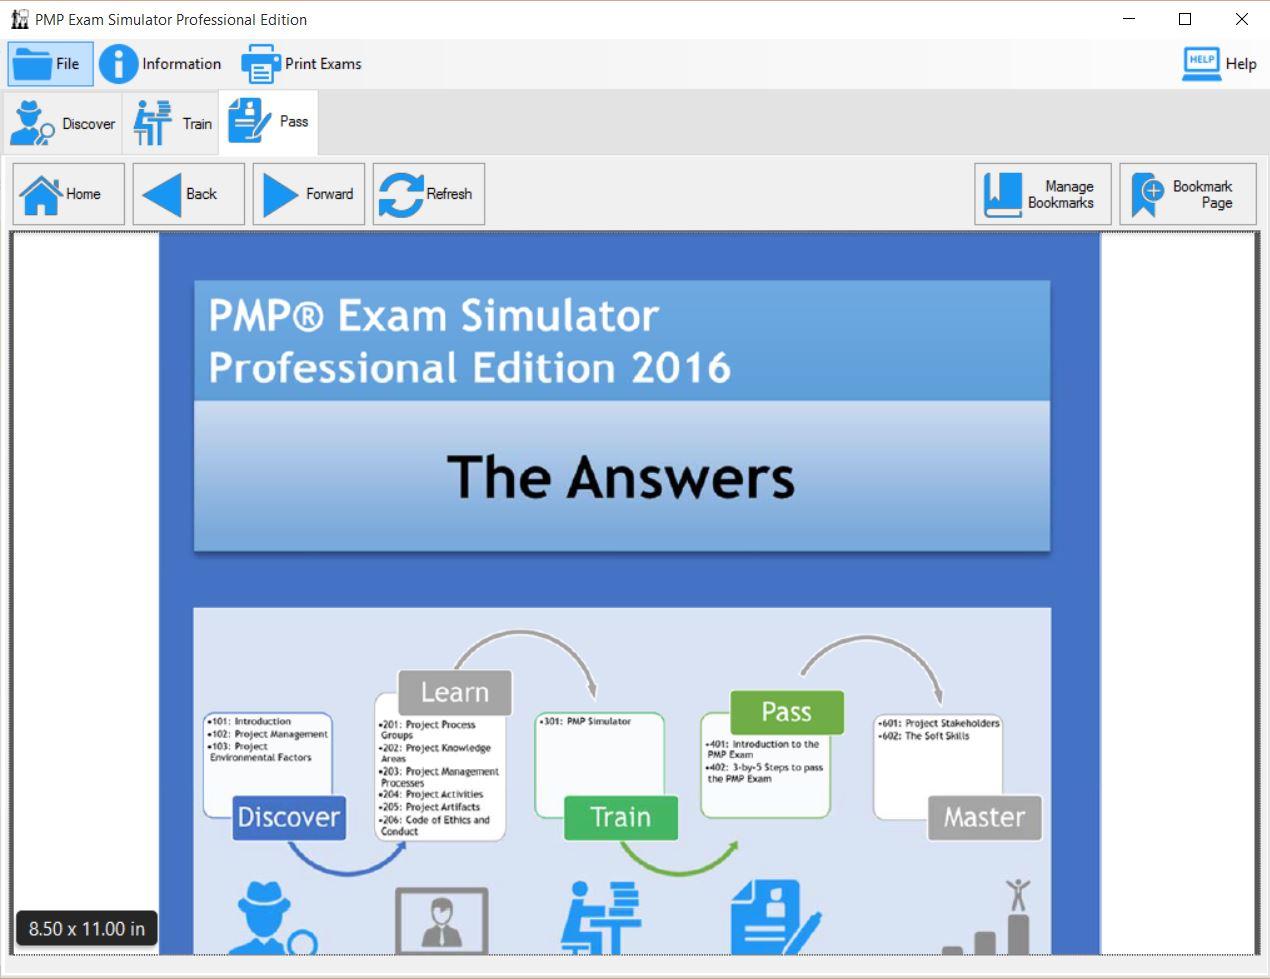 Amazon pmp exam simulator professional edition 2016 sp1 amazon pmp exam simulator professional edition 2016 sp1 download software xflitez Choice Image